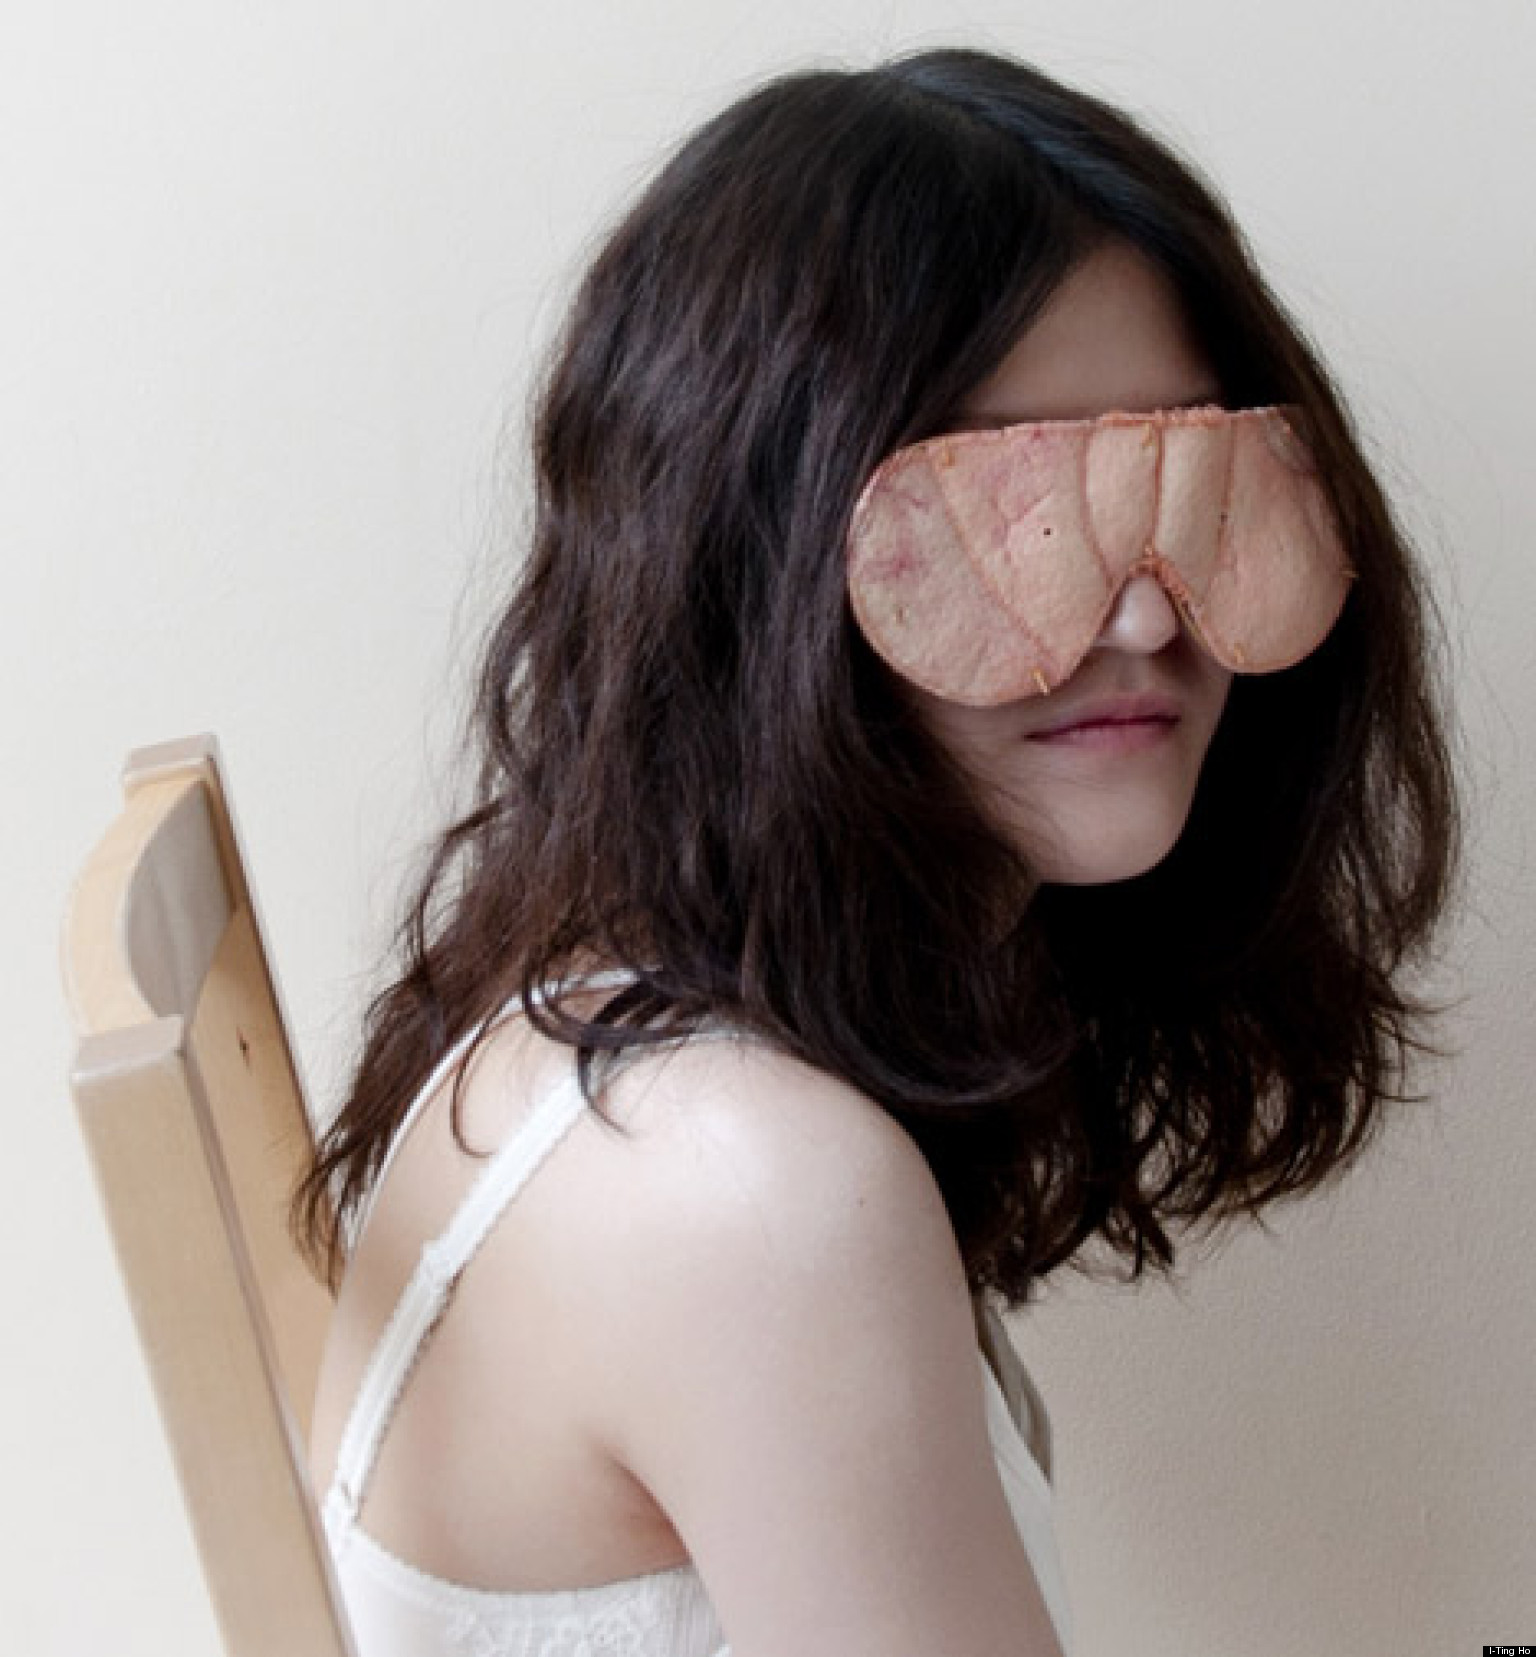 I-Ting Ho's 'Skin Secret' Accessory Line Is Really Gross ...